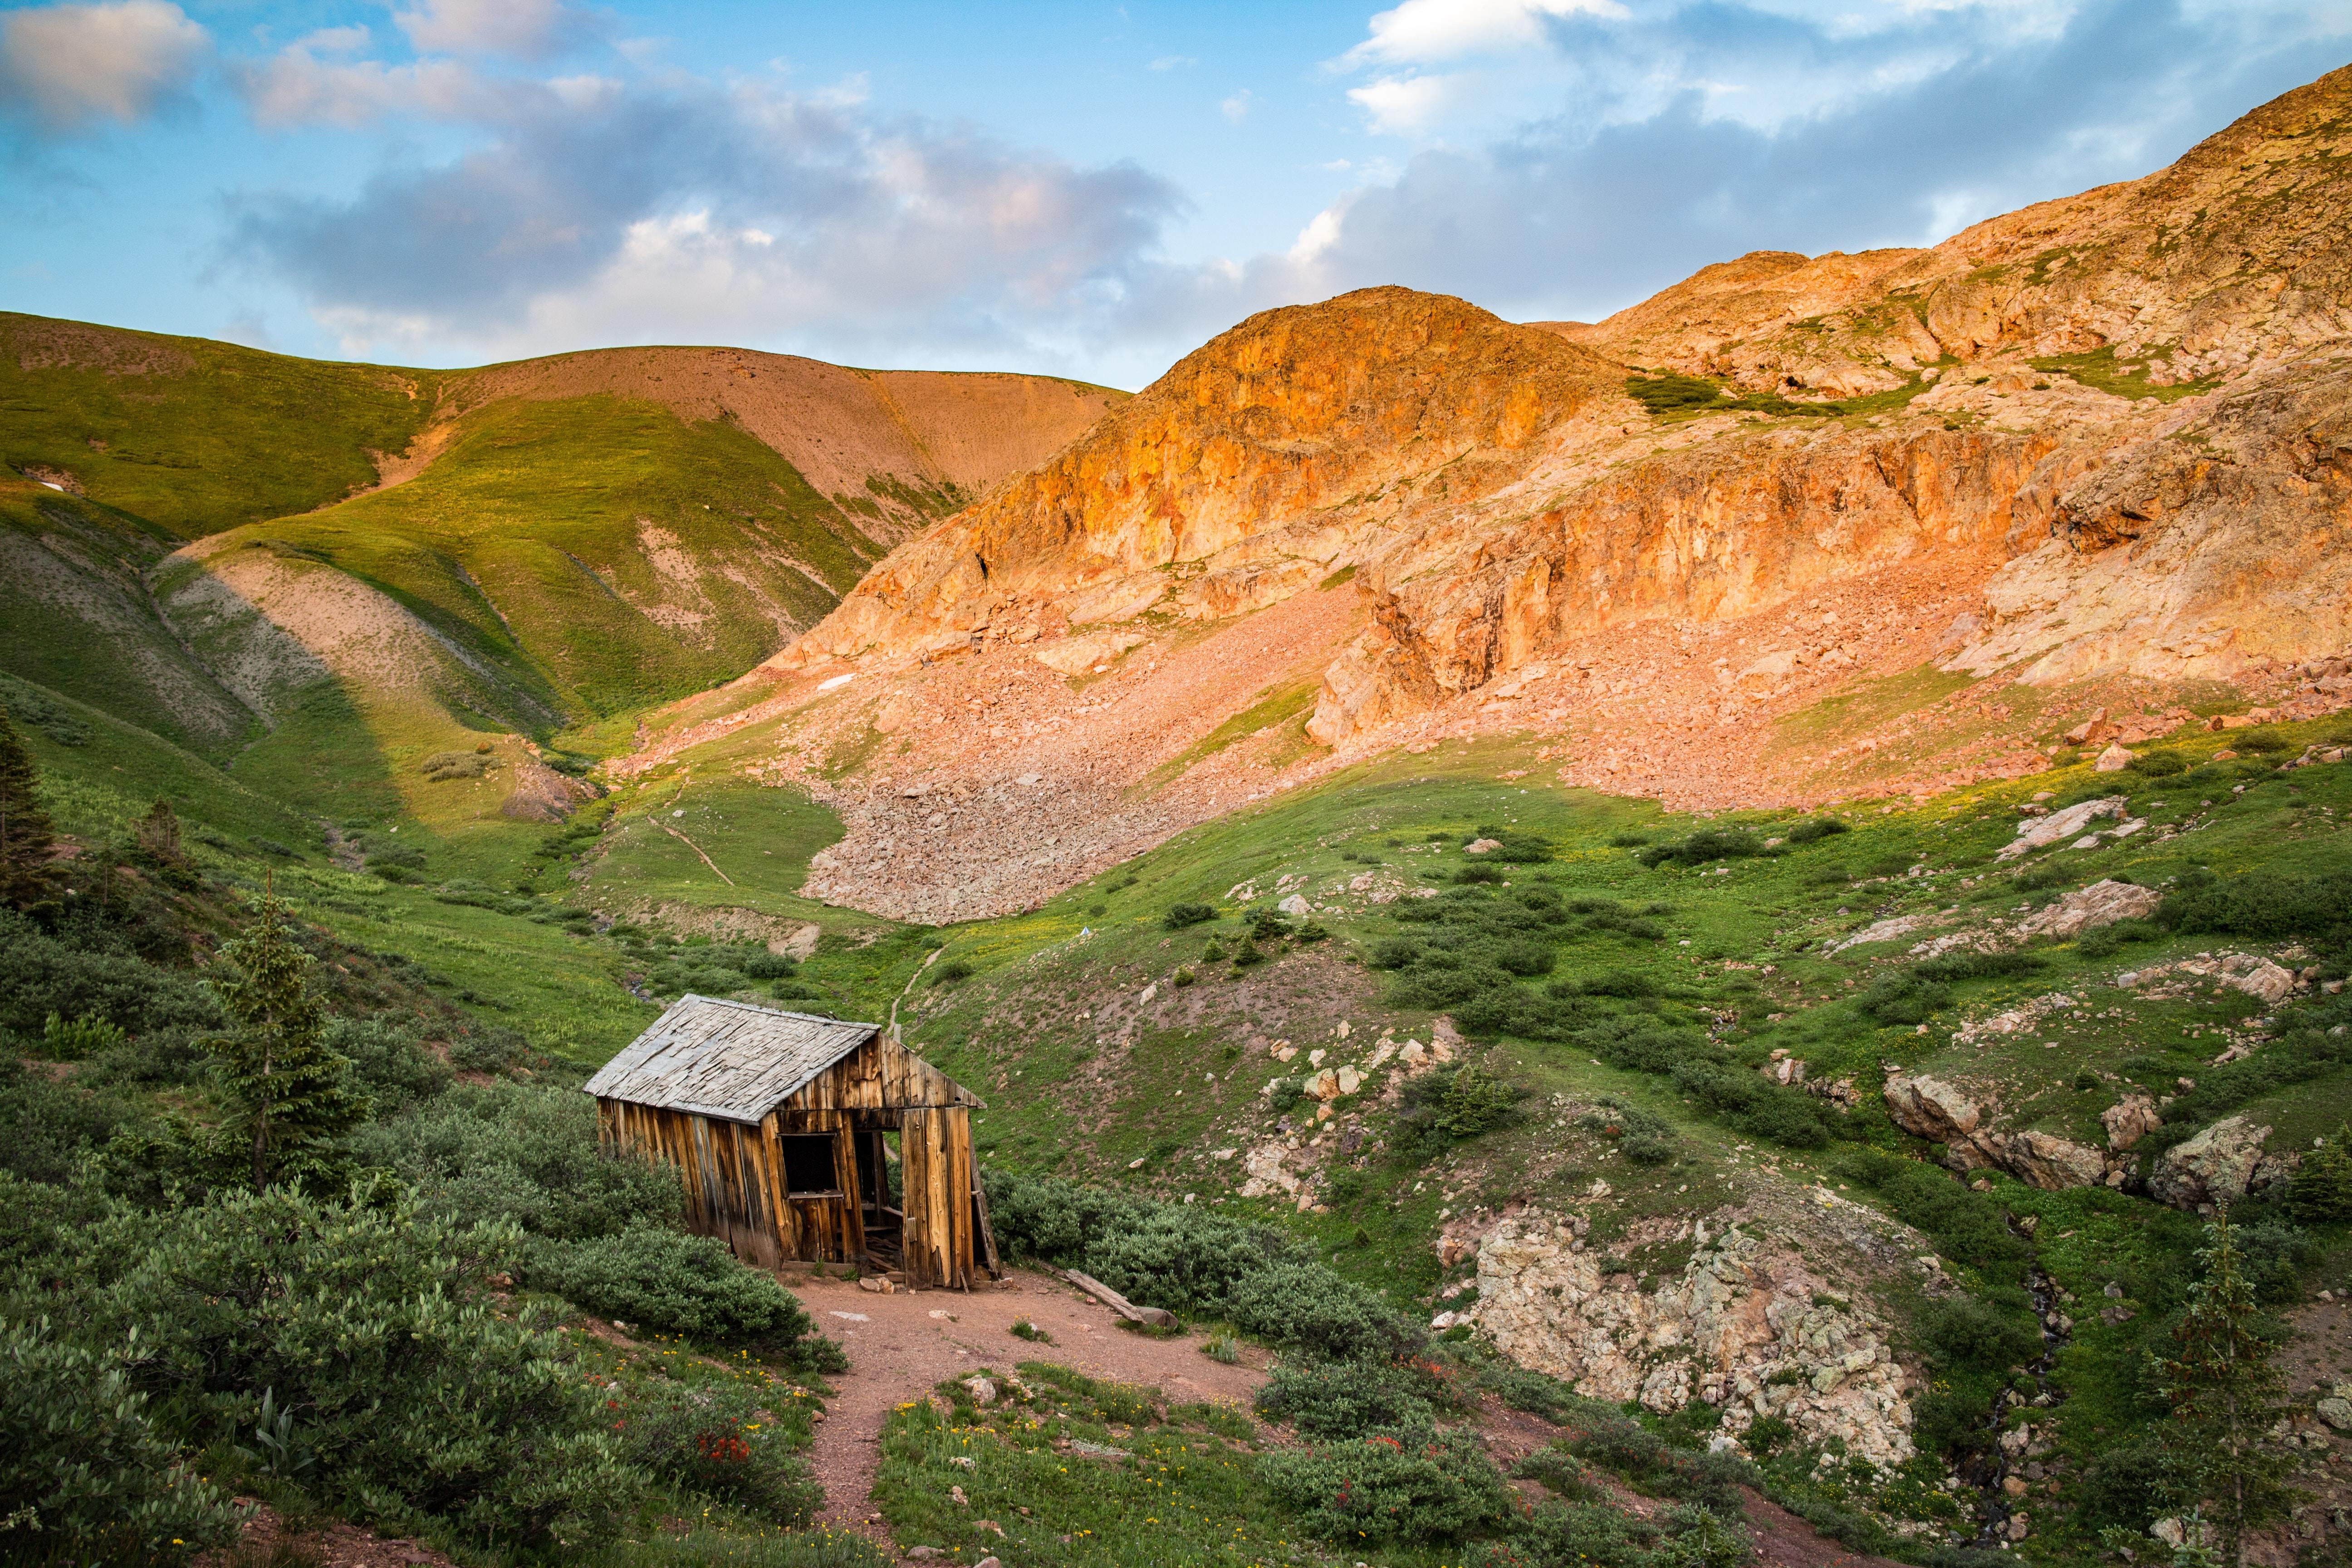 photo of house on mountain